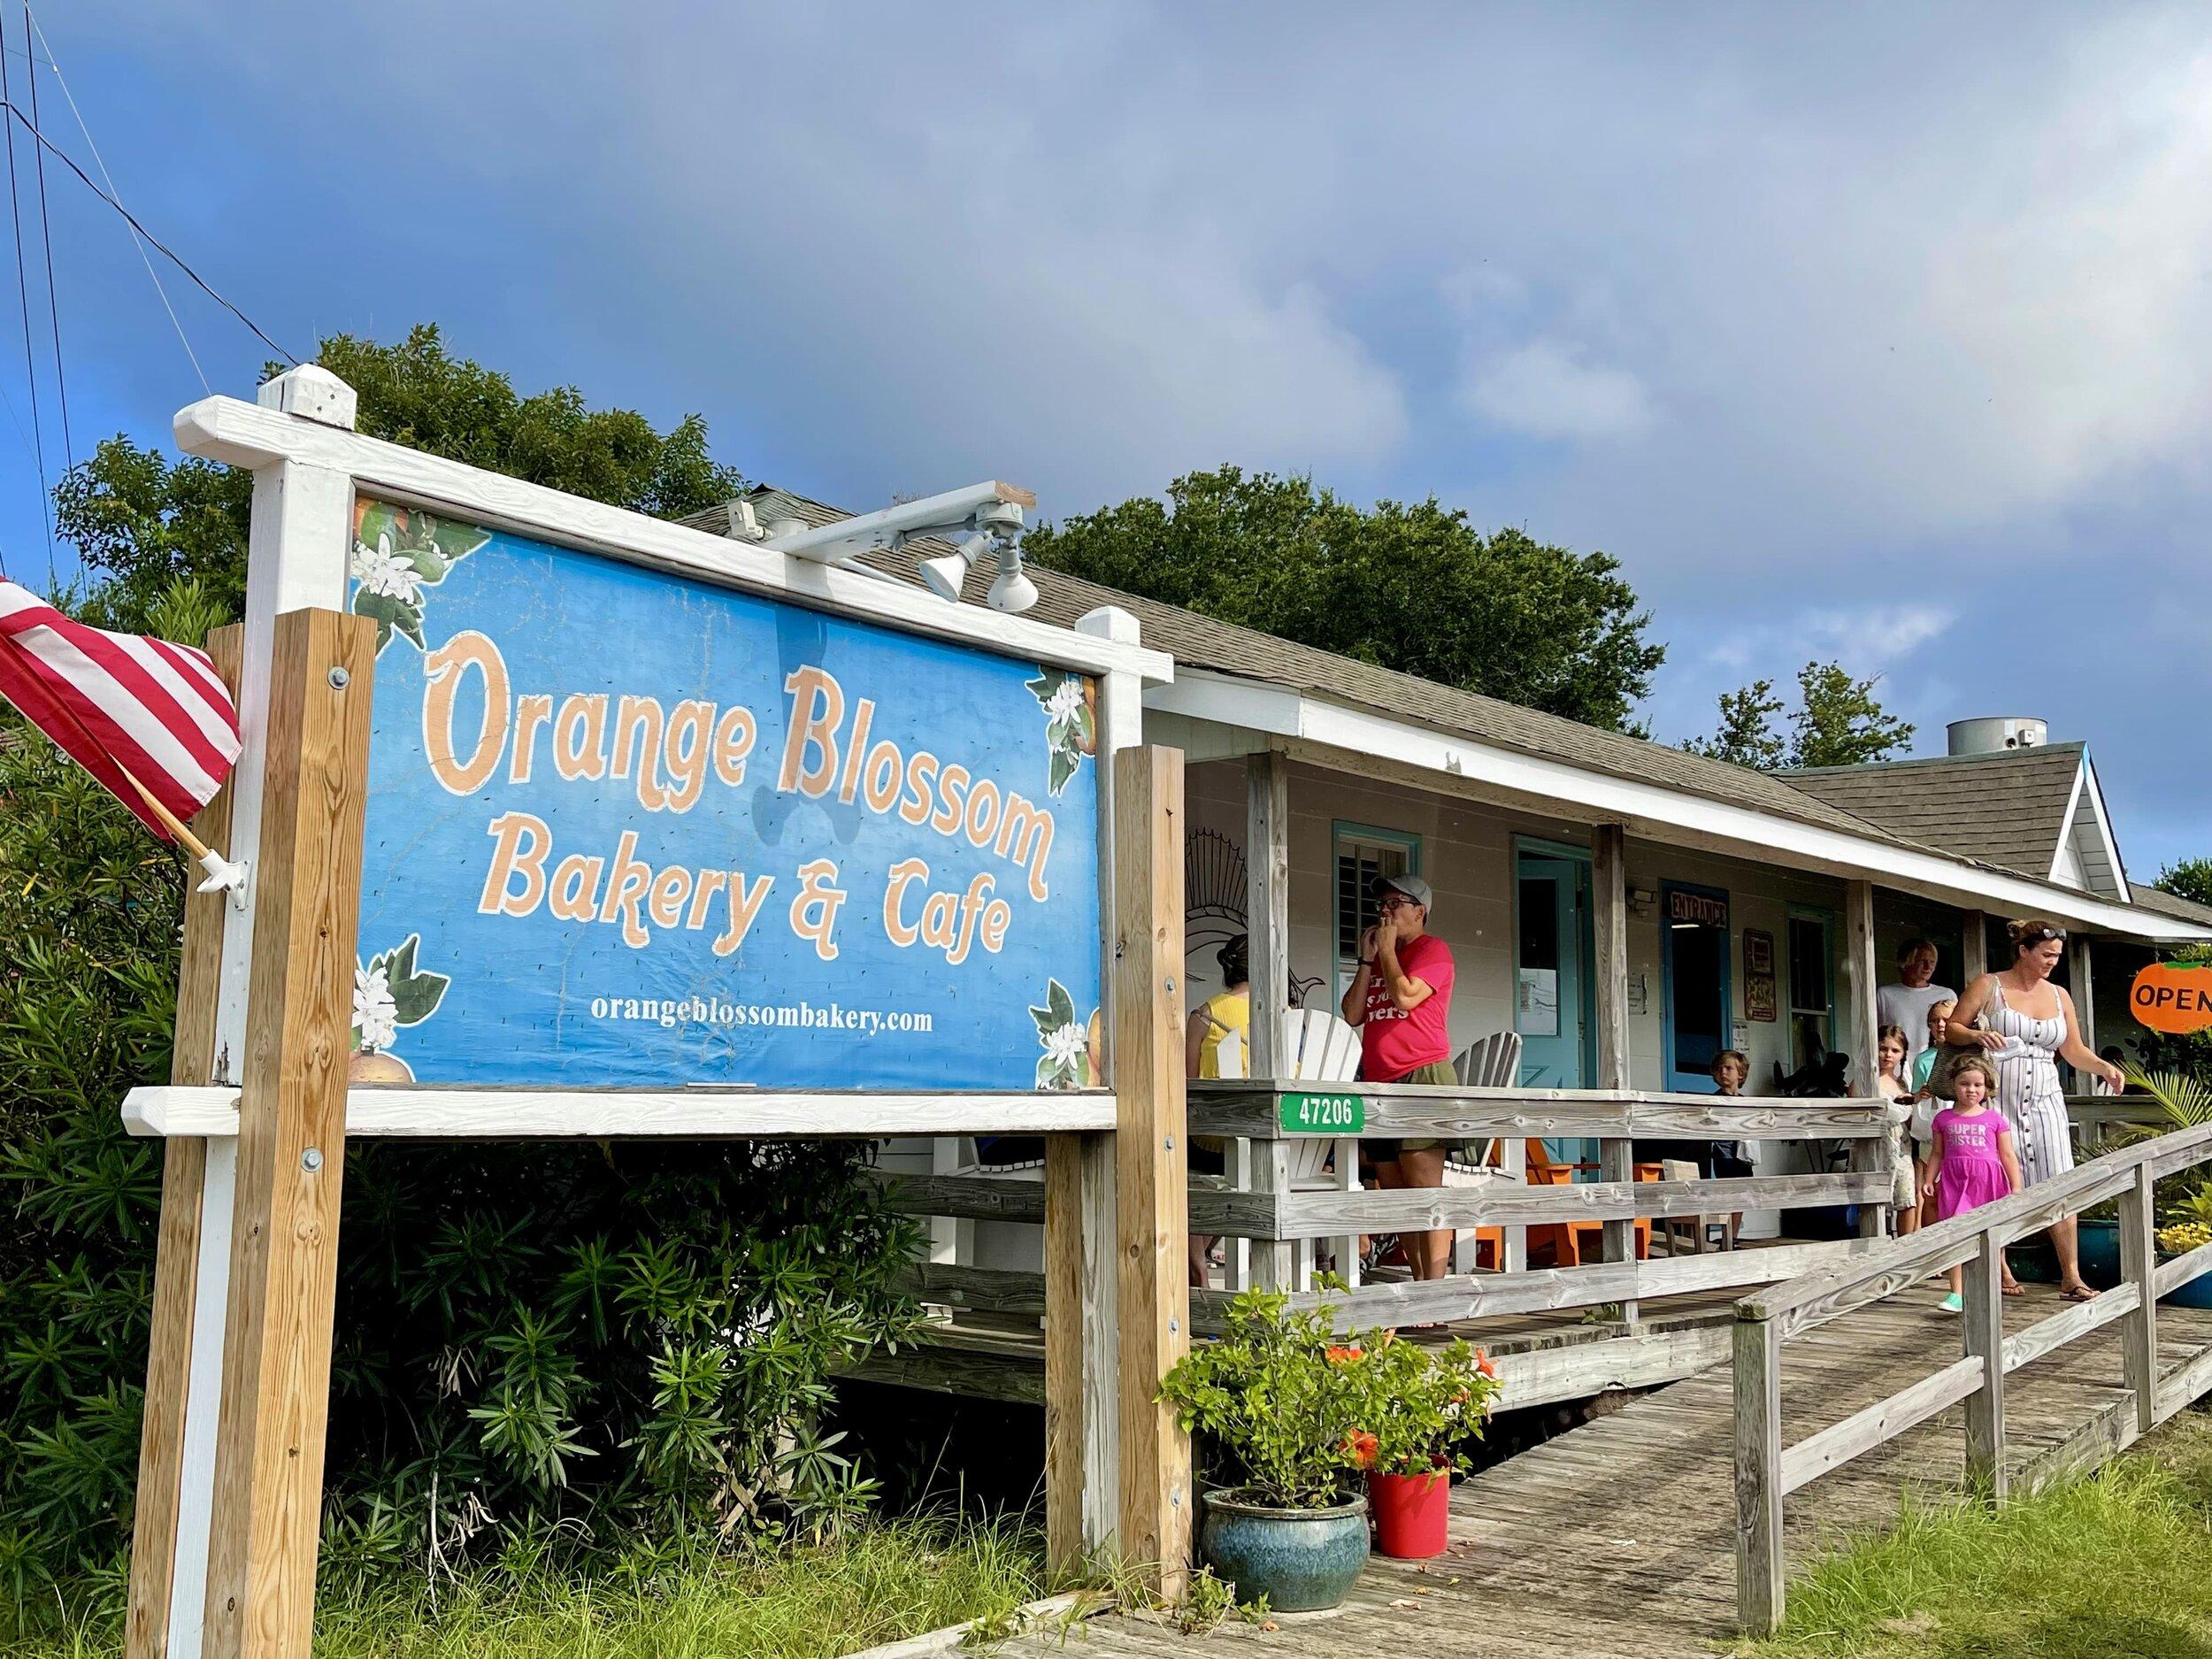 Orange Lossom Bakery & Cafe